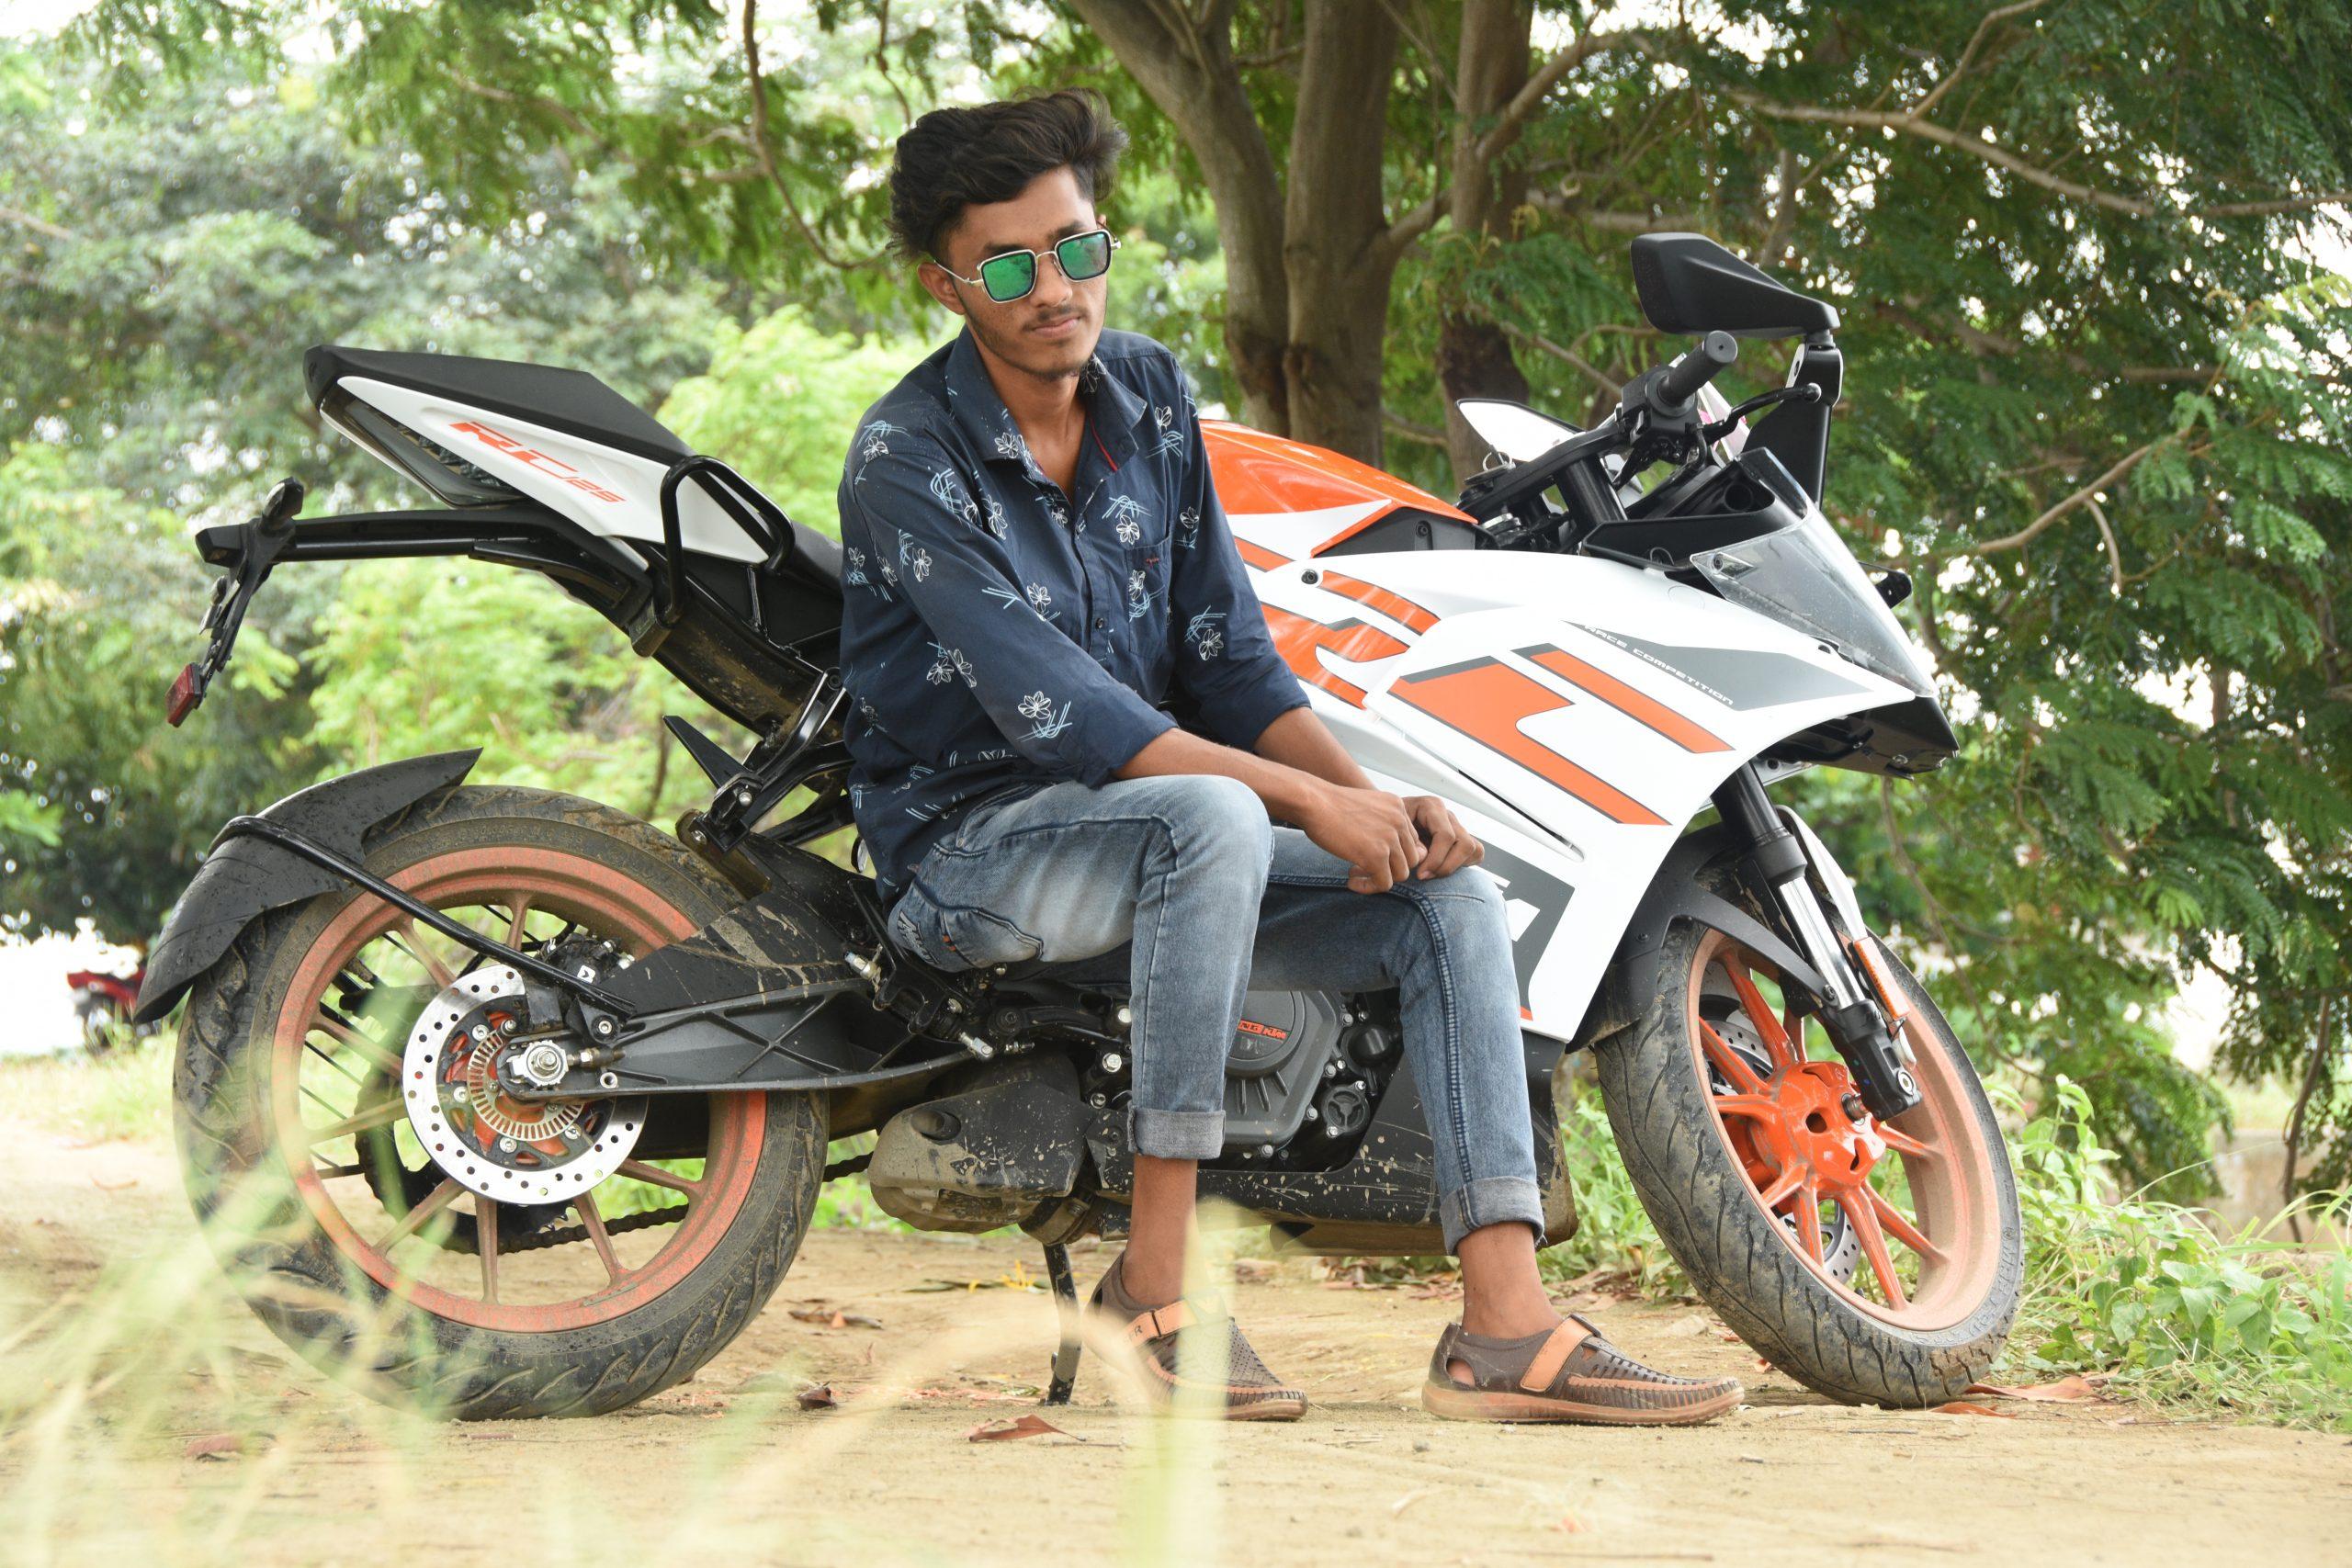 Boy sitting on KTM bike